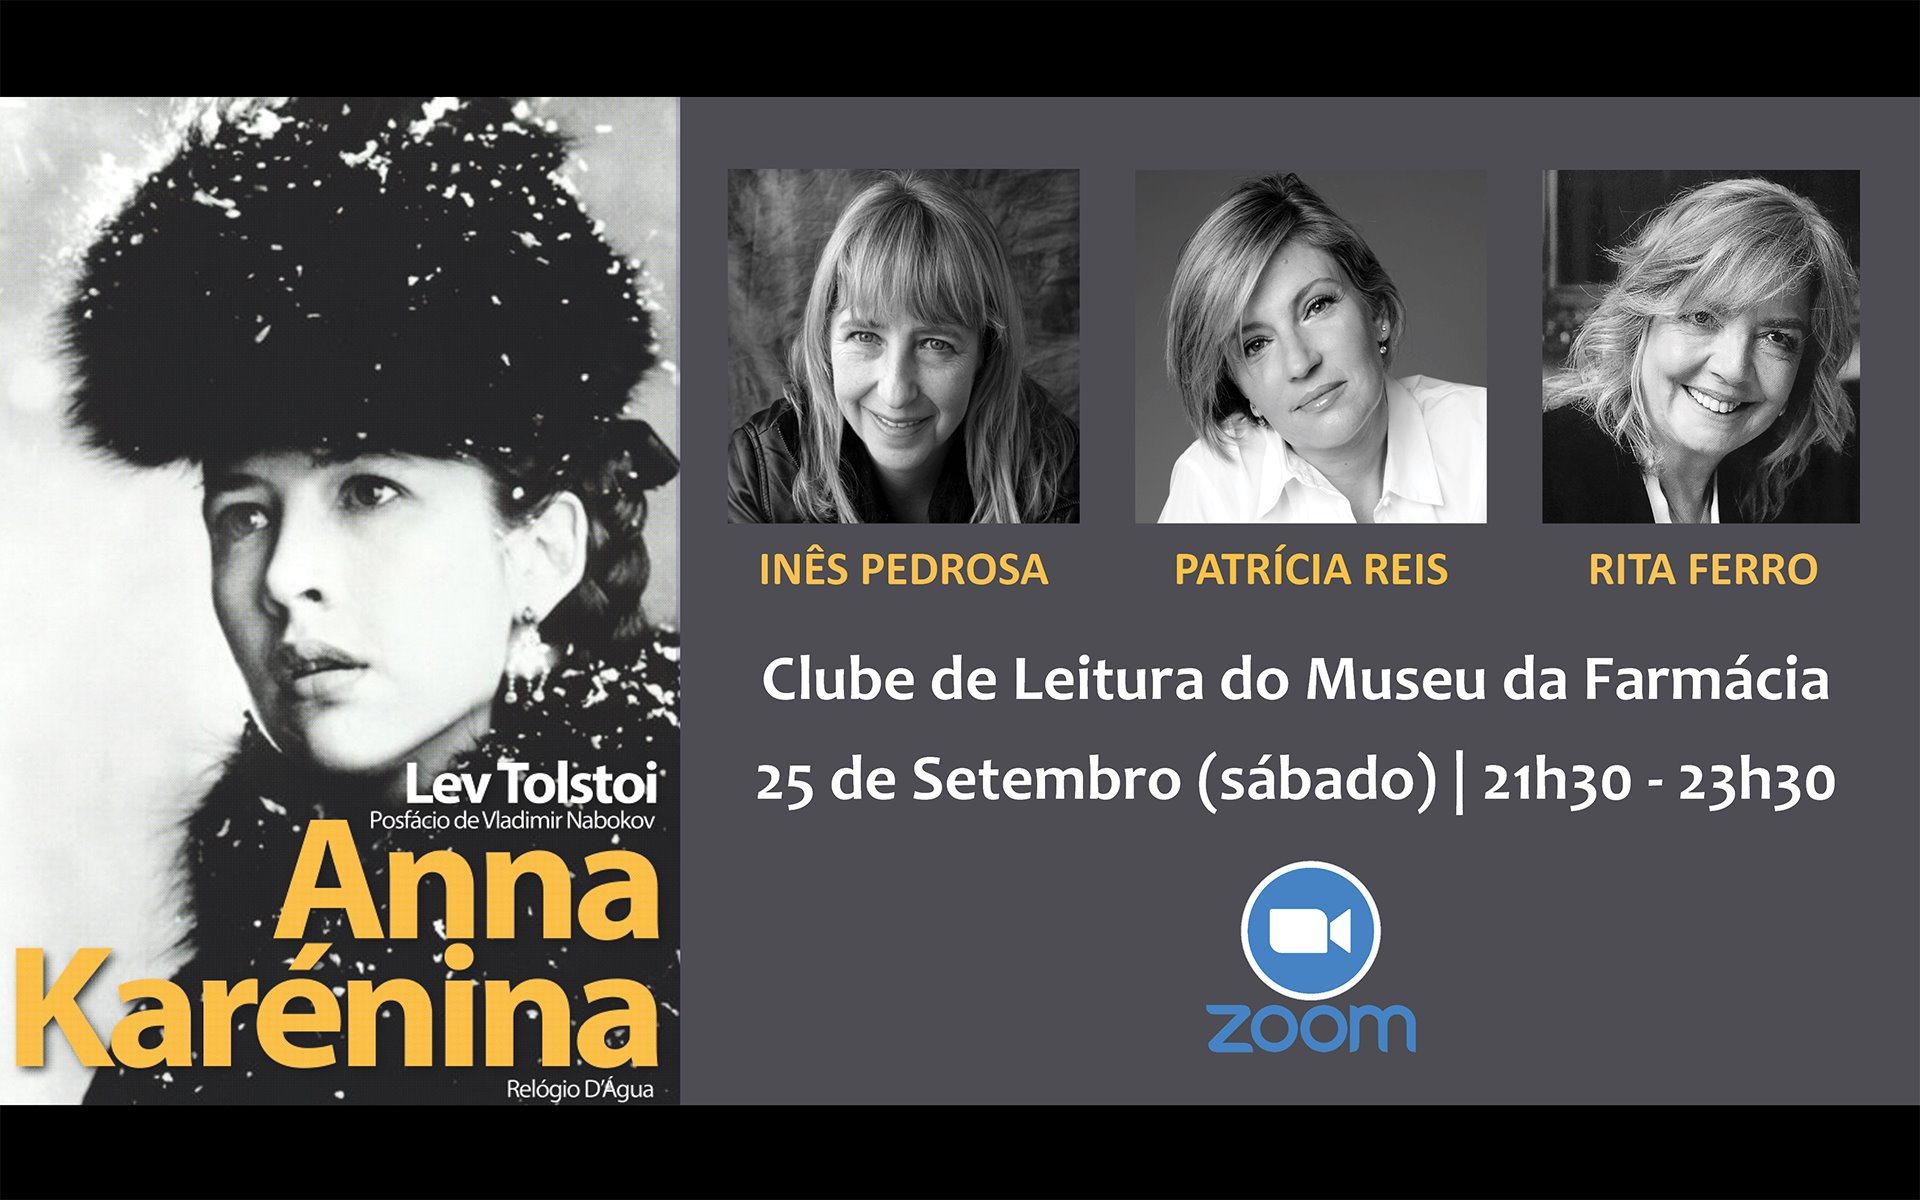 Conversa: 'Anna Karénina' de Lev Tolstoi